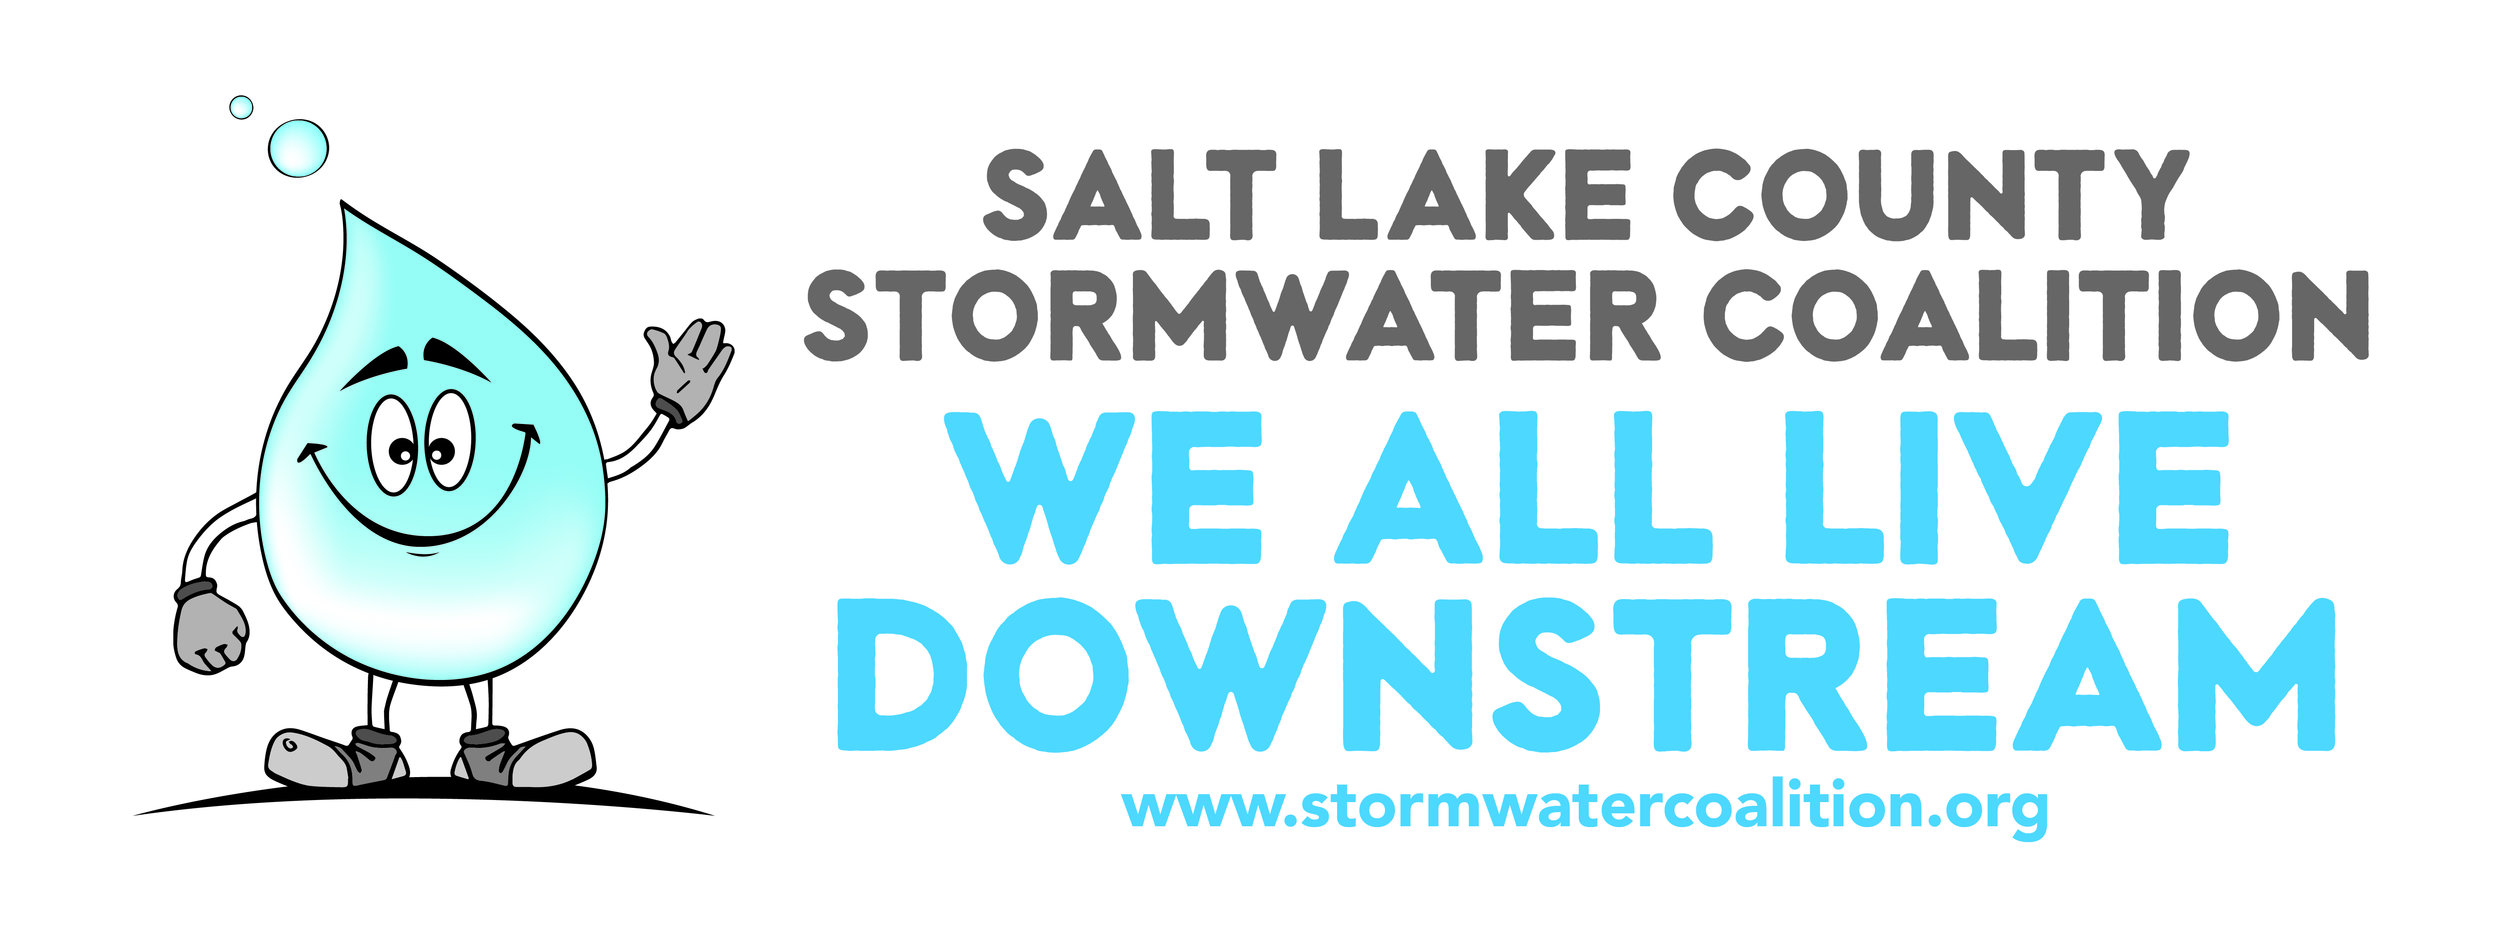 SL County Stormwater Logo.jpg